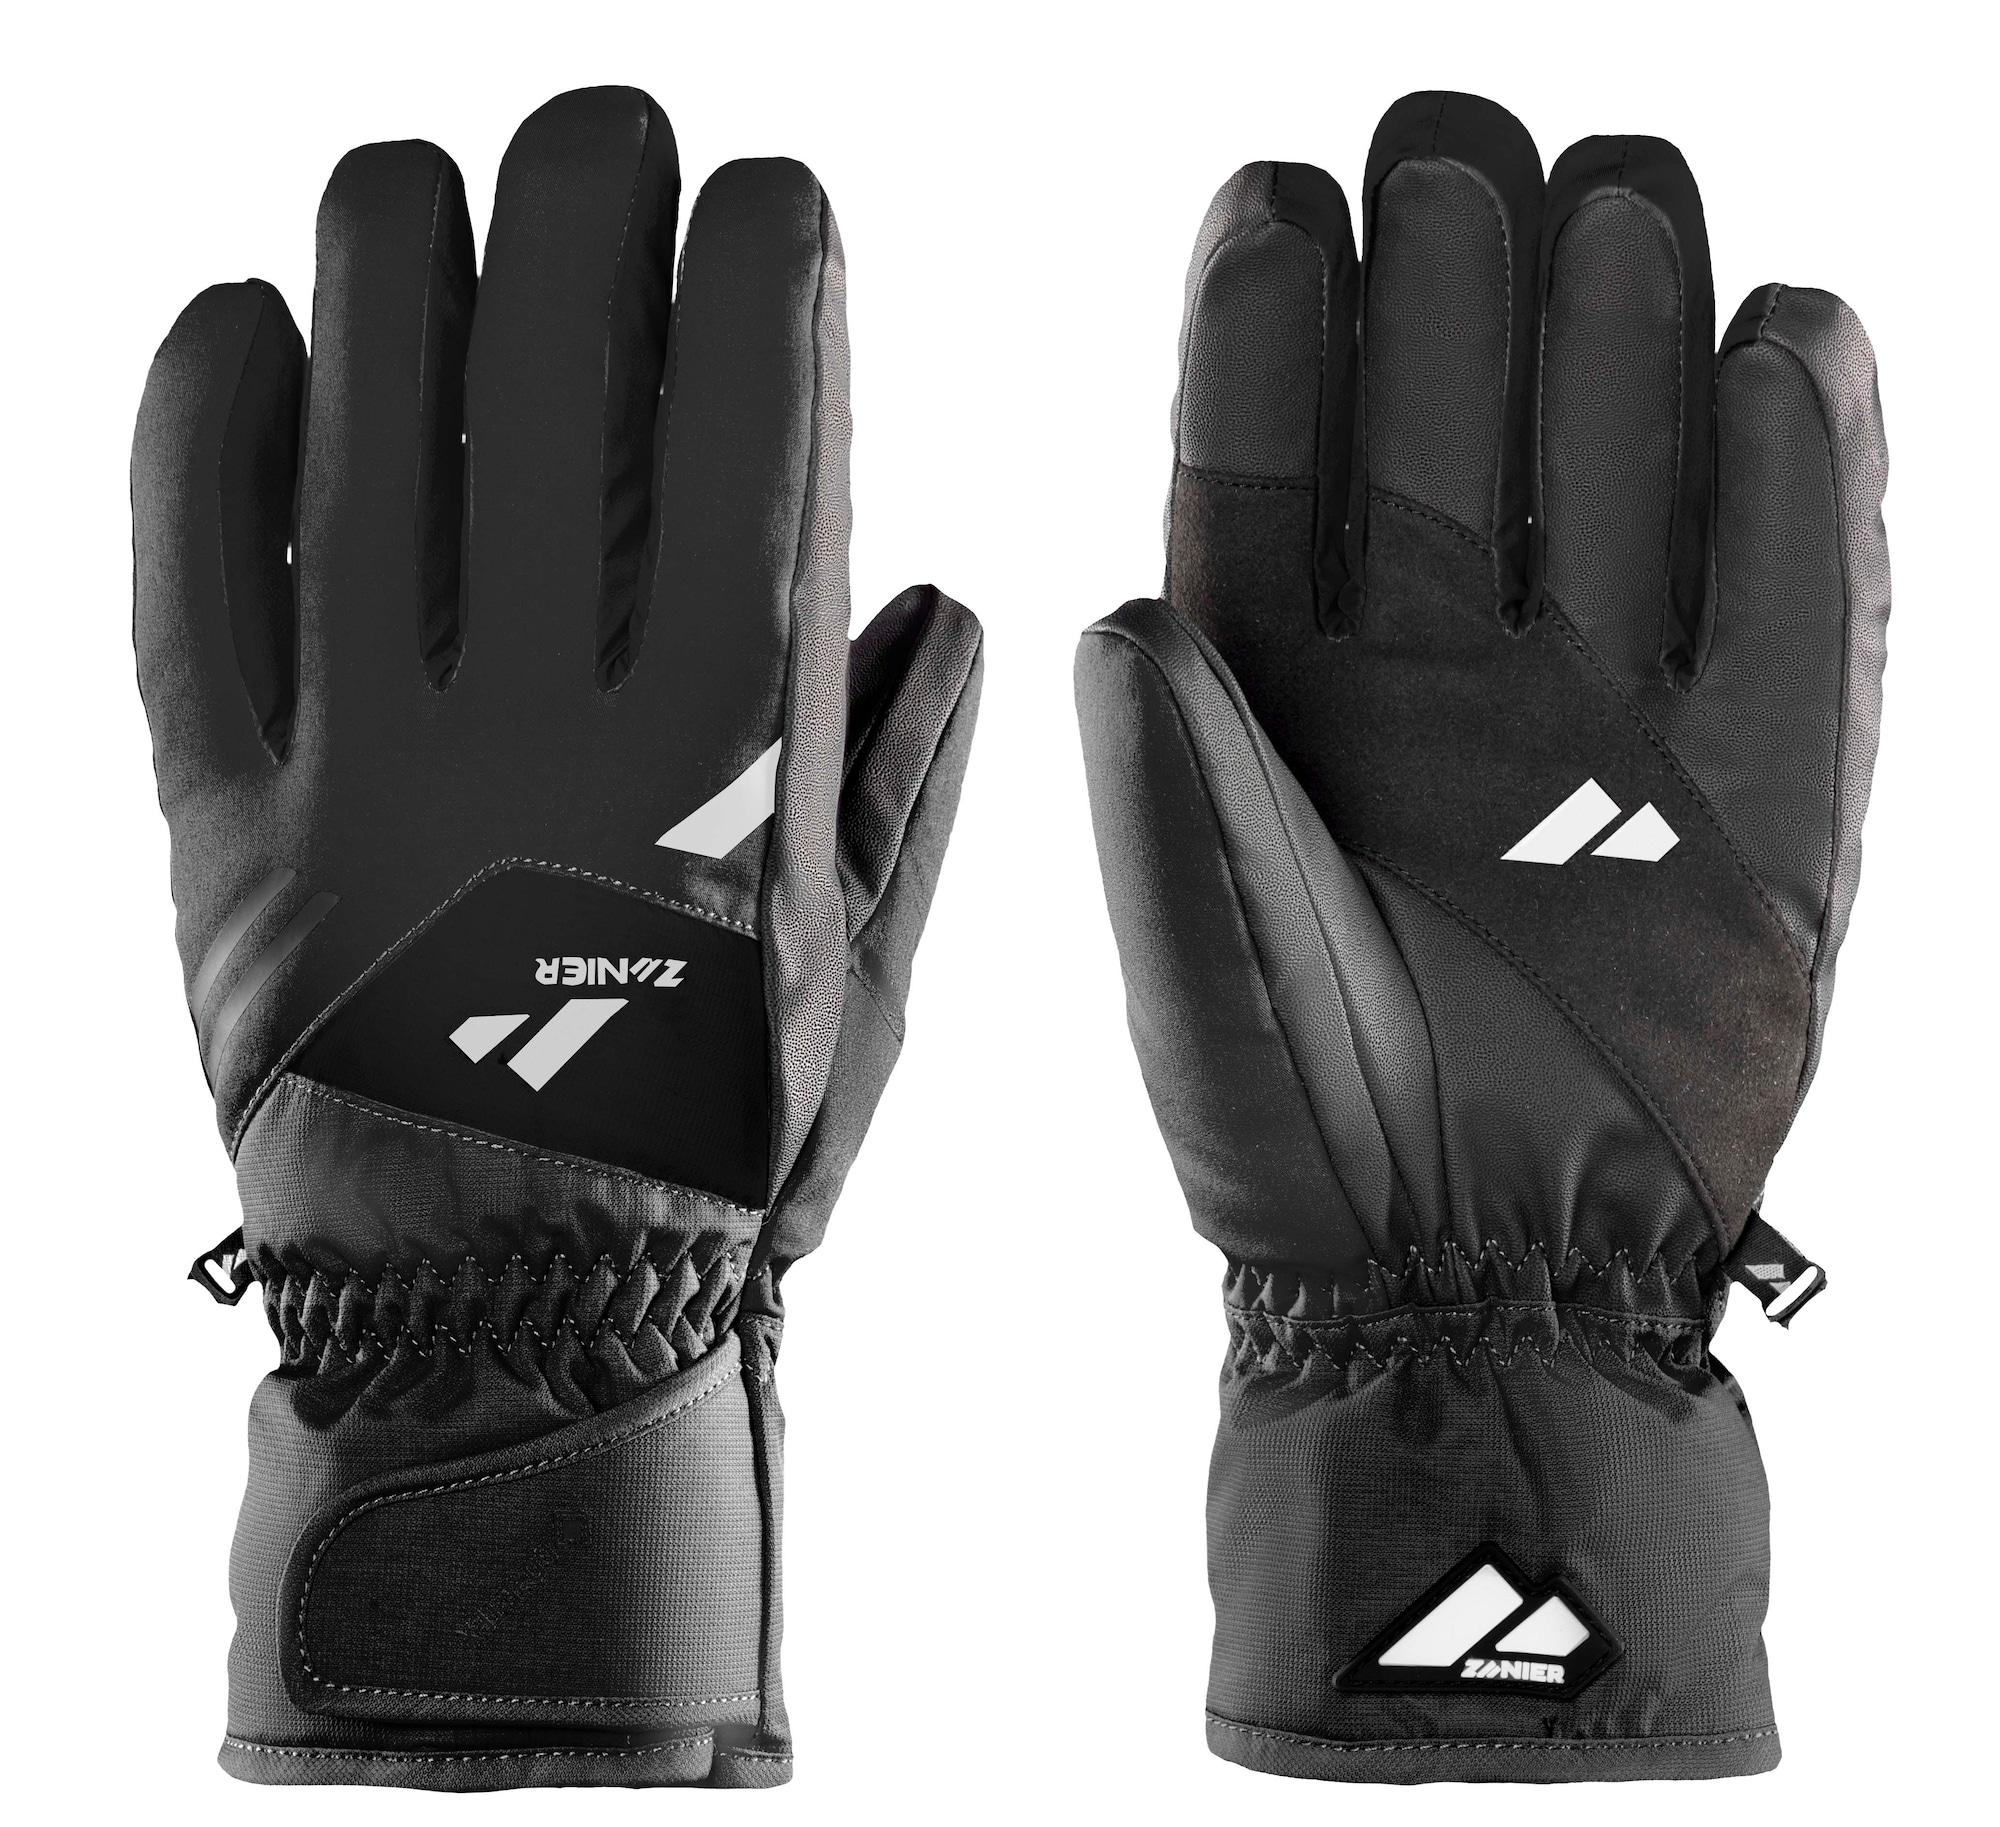 Handschuhe | Accessoires > Handschuhe > Sonstige Handschuhe | Zanier